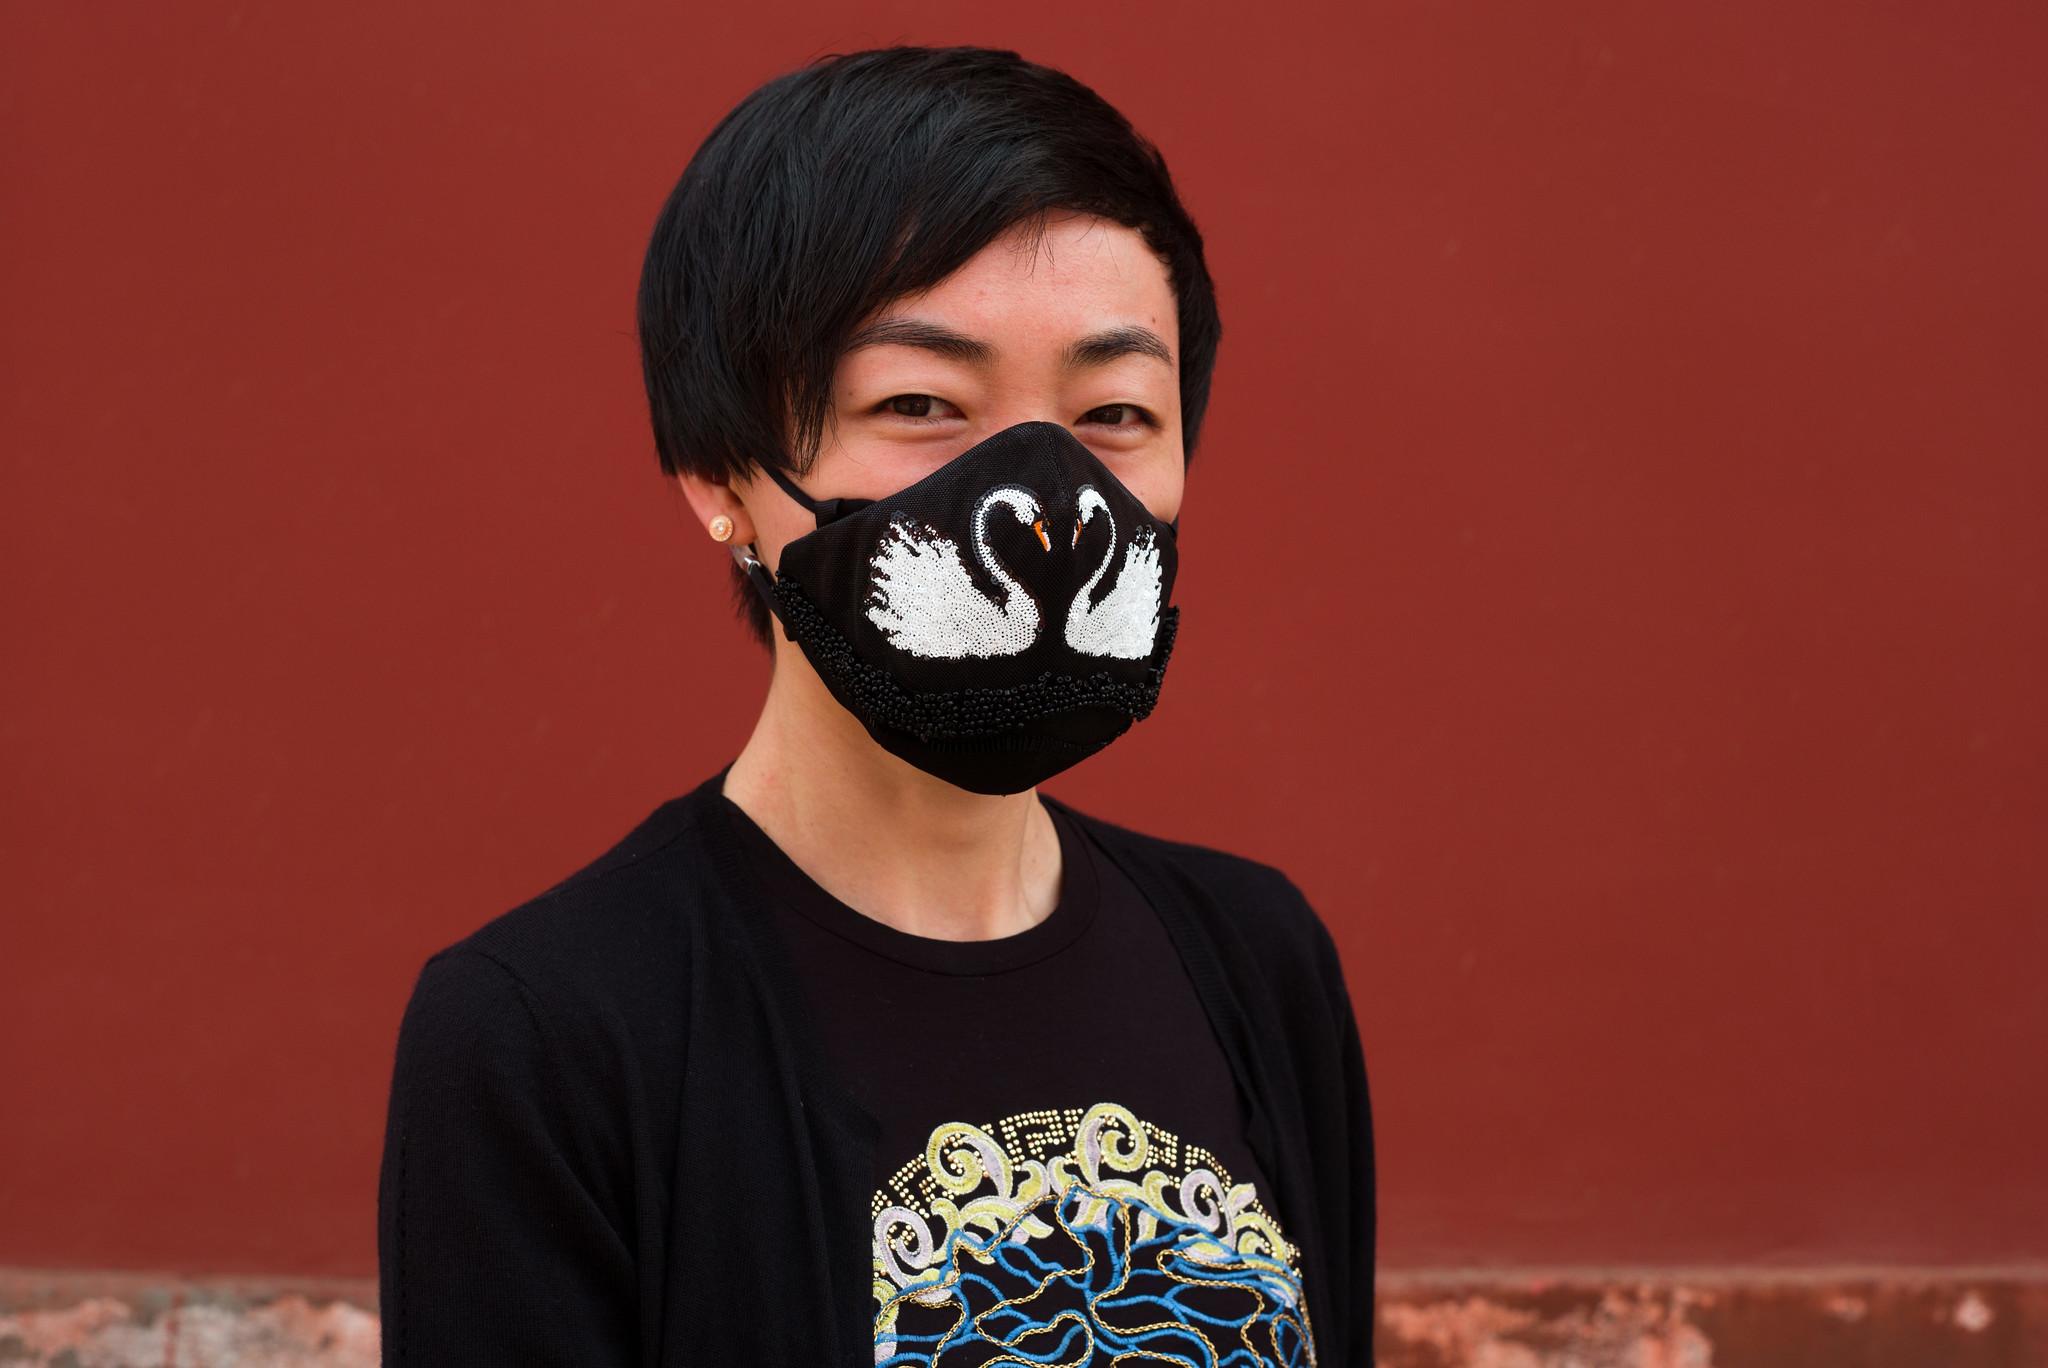 Maske-Schwan